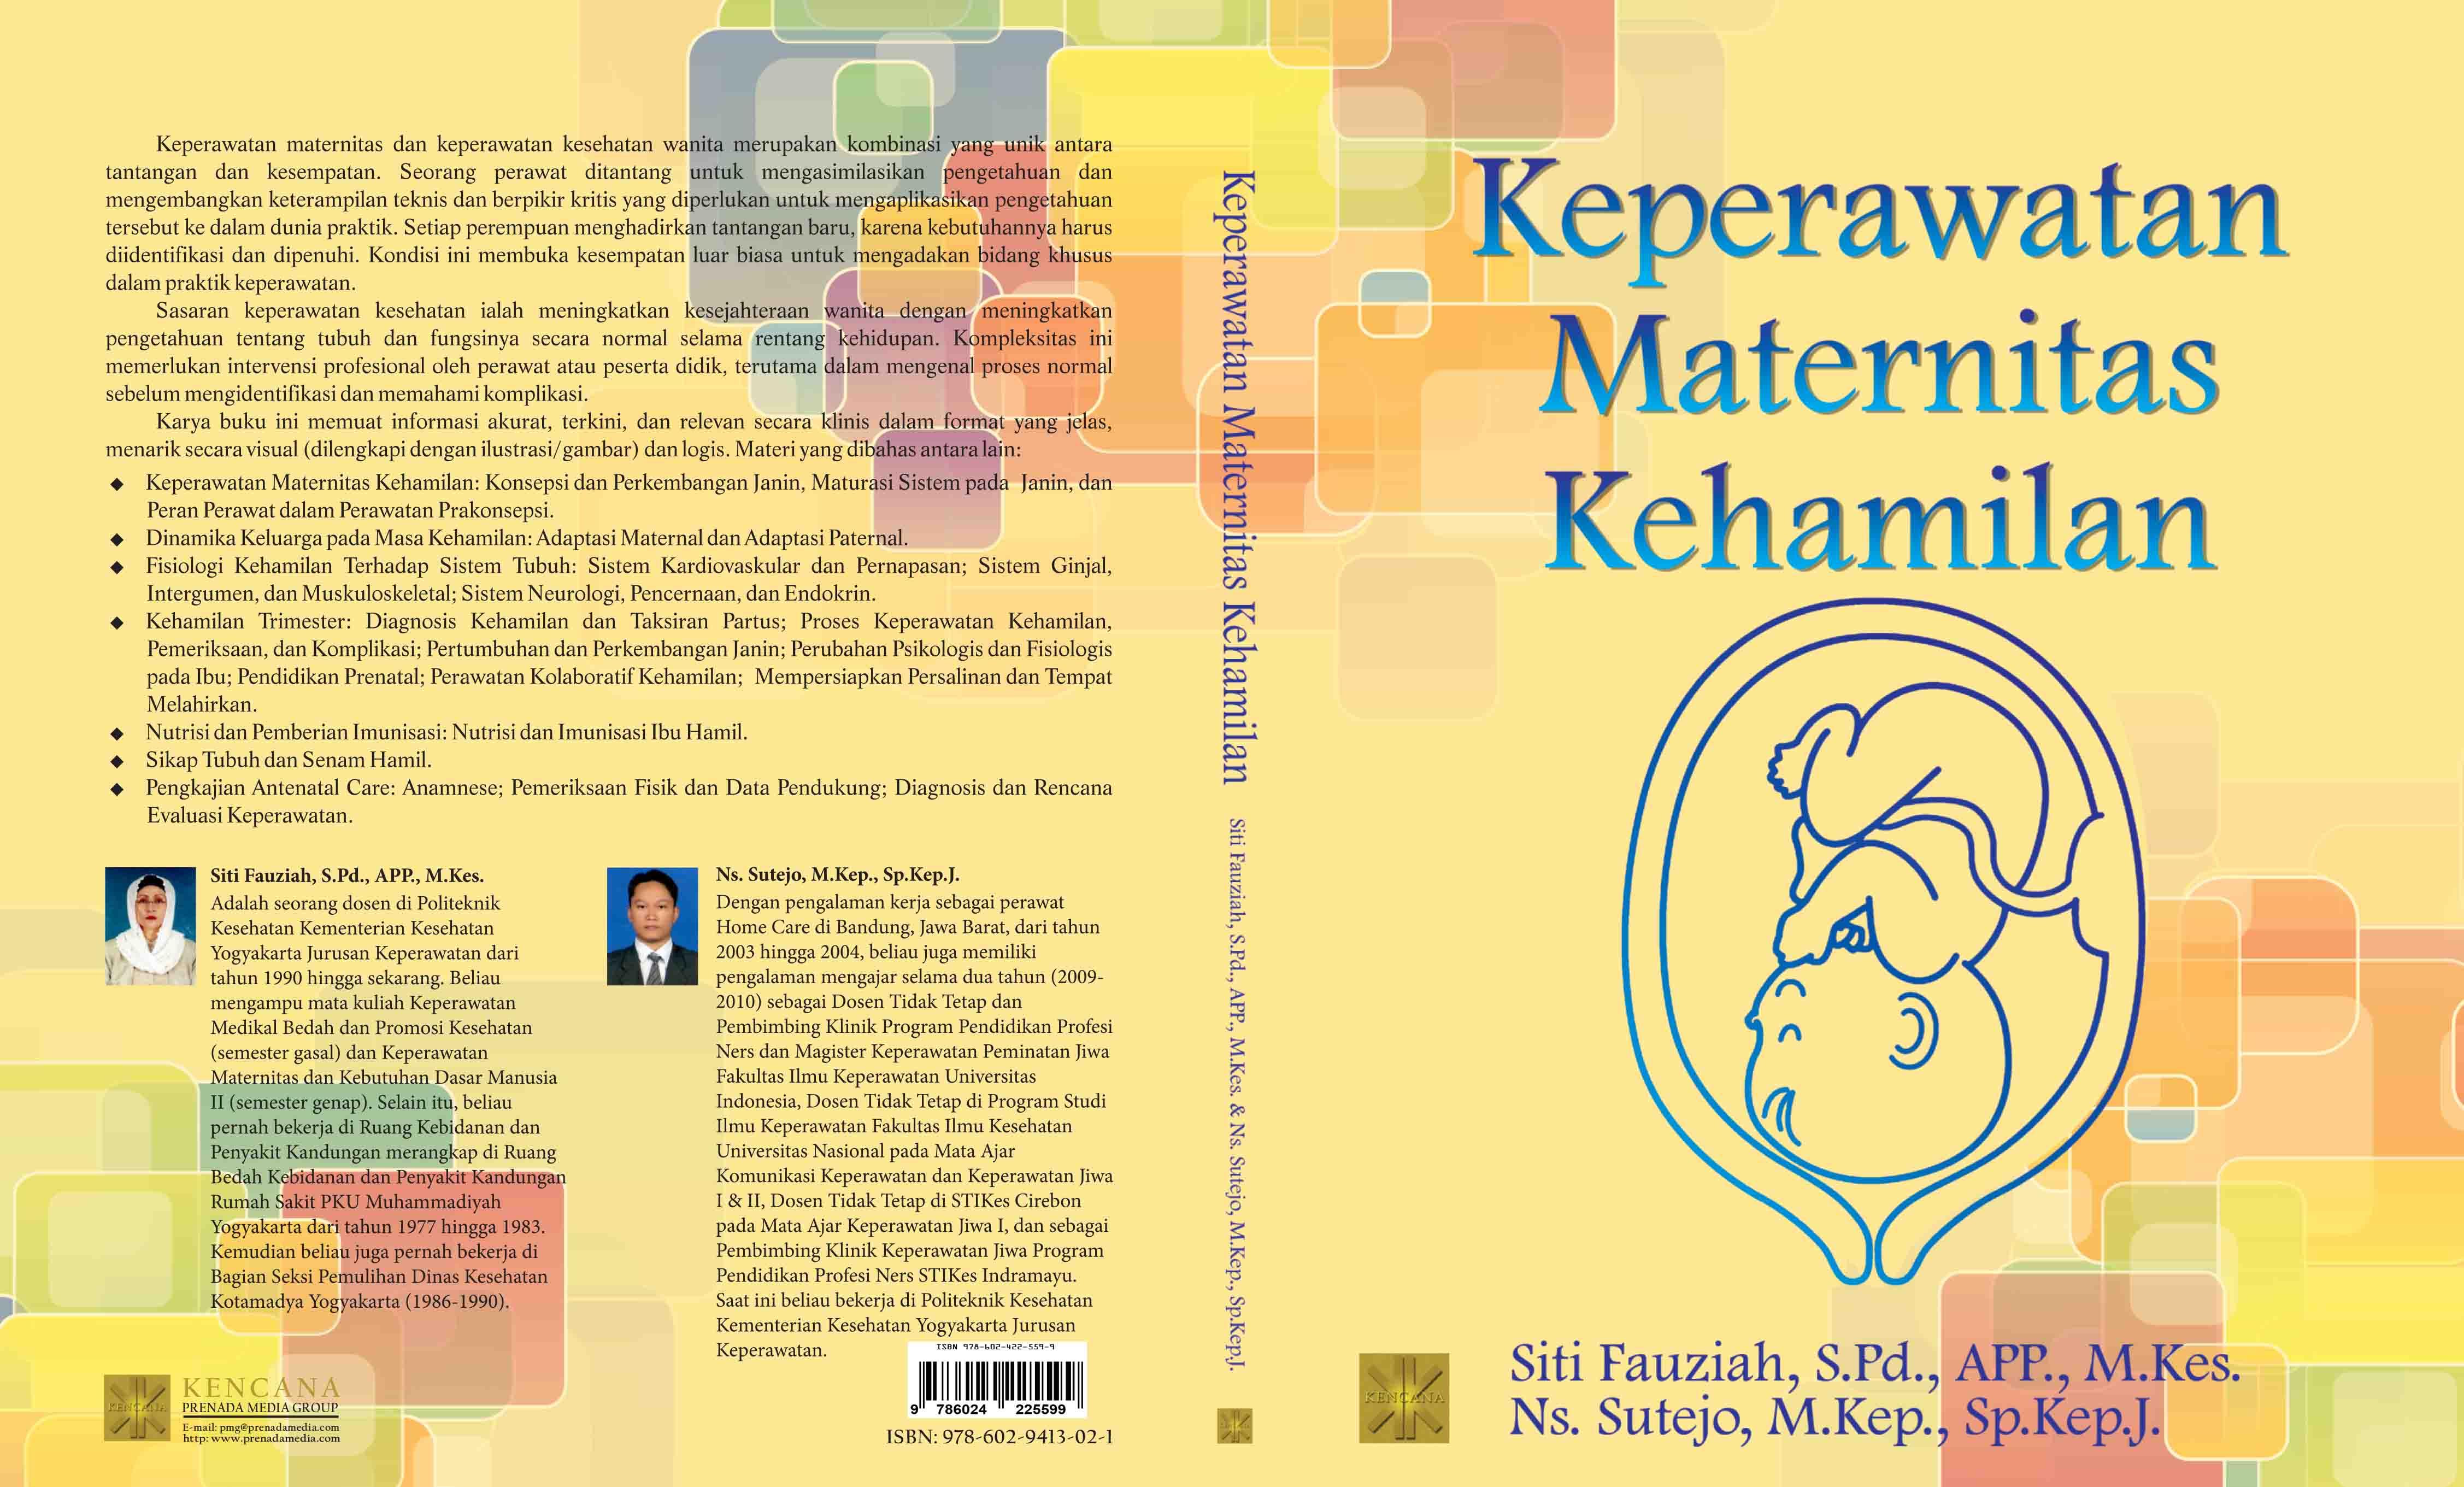 Buku ajar keperawatan maternitas kehamilan vol. 1 [sumber elektronis]